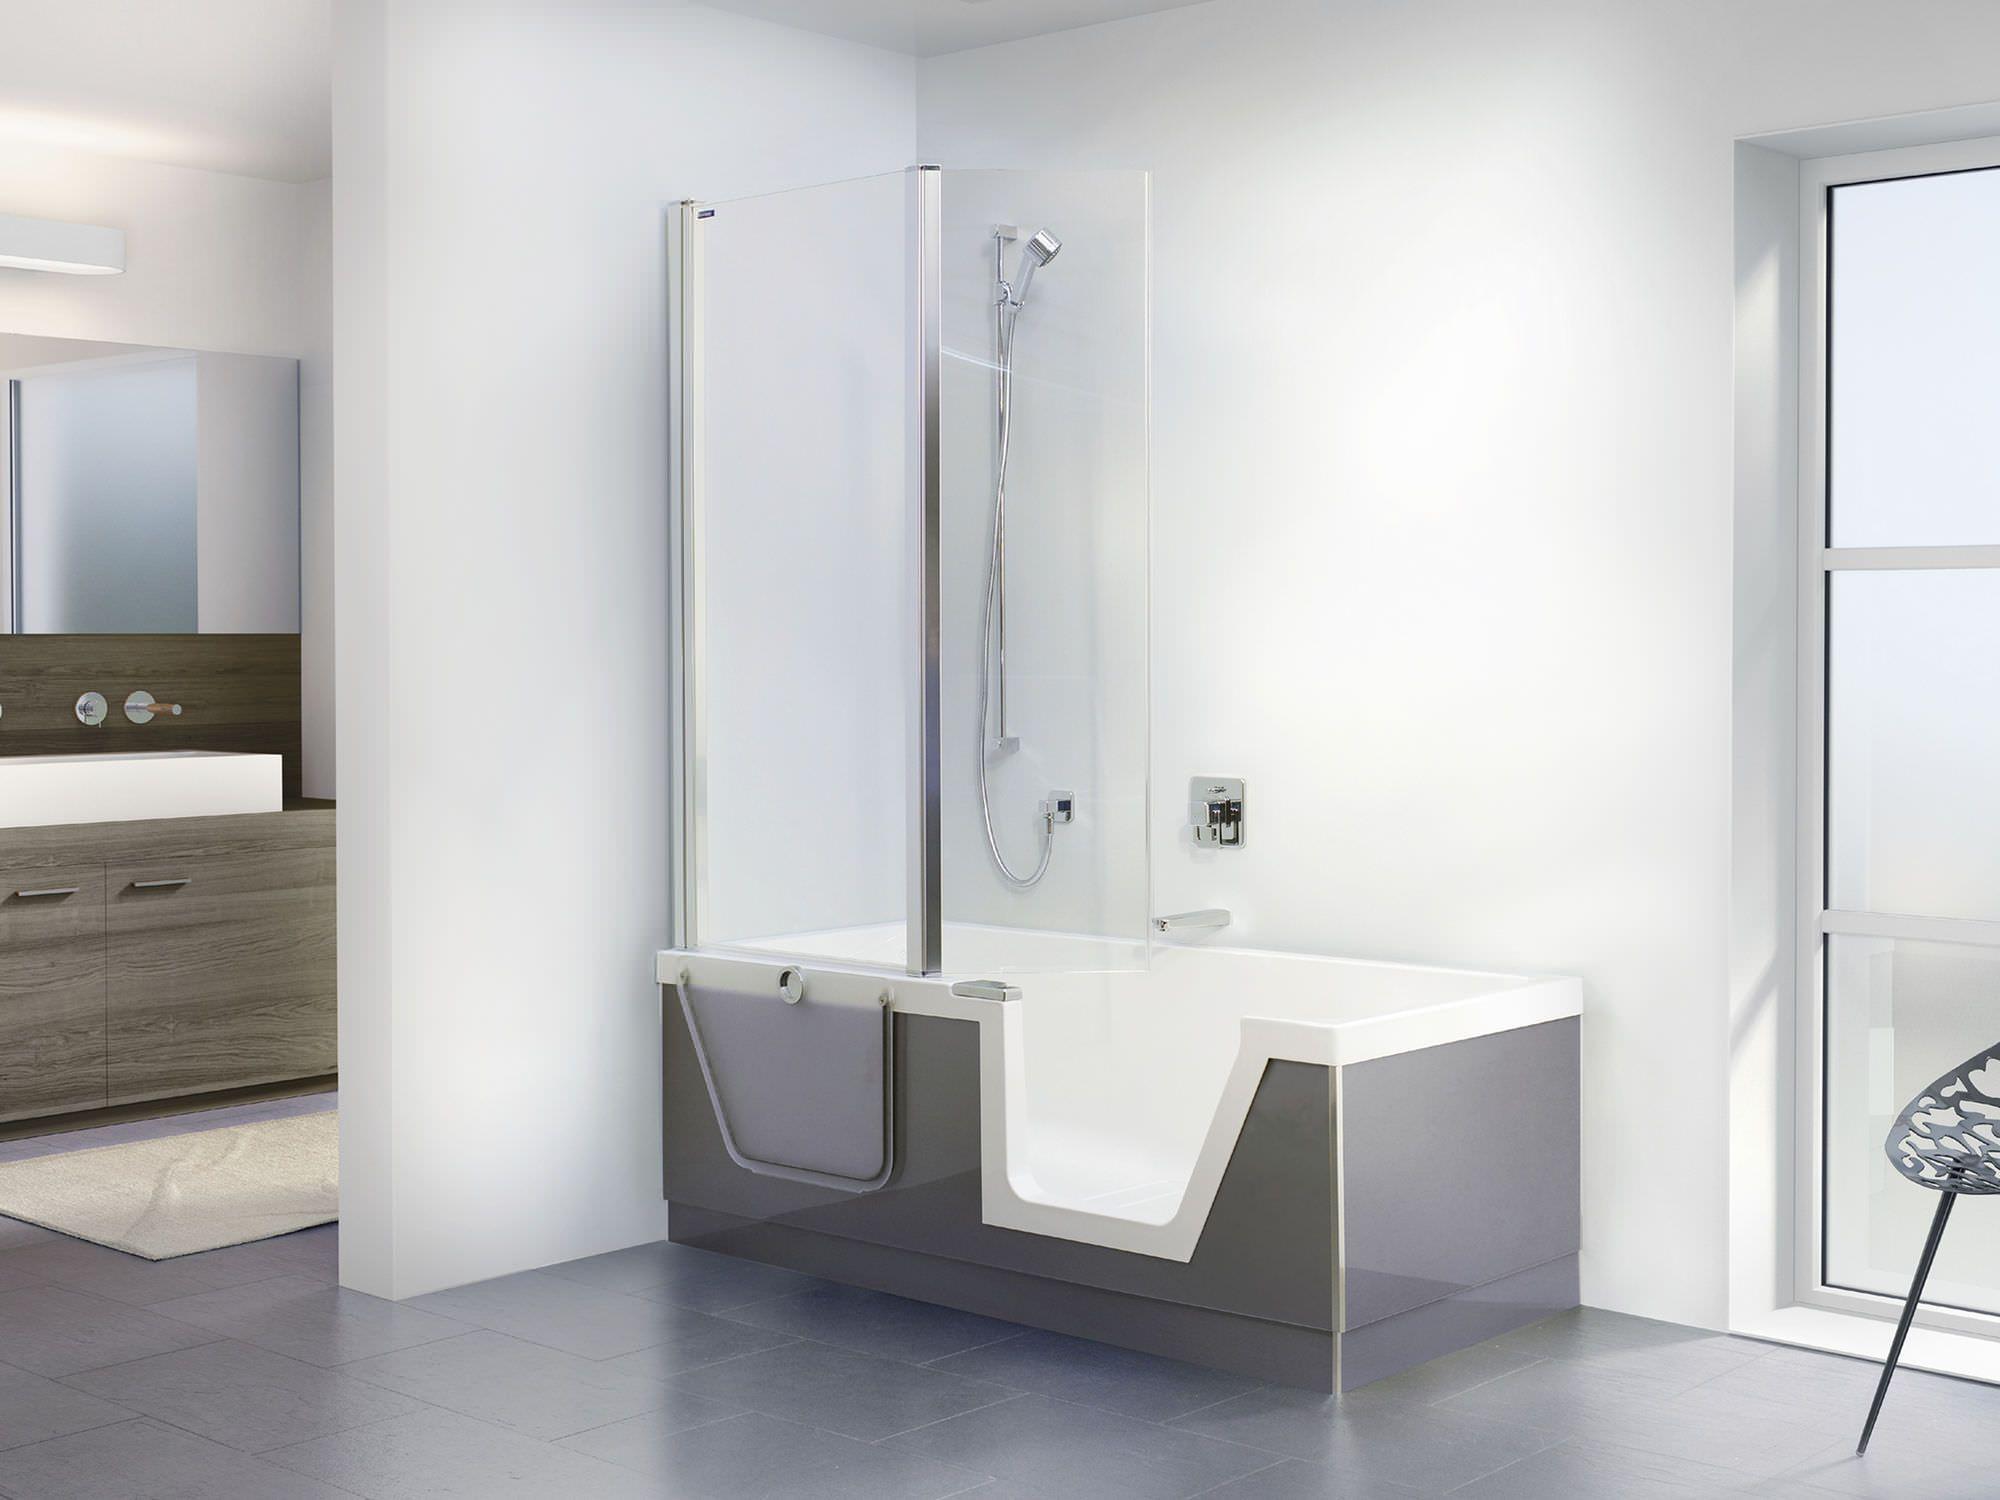 Badezimmerdesign mit jacuzzi rectangular bathtubshower combination stepin pure duscholux ag